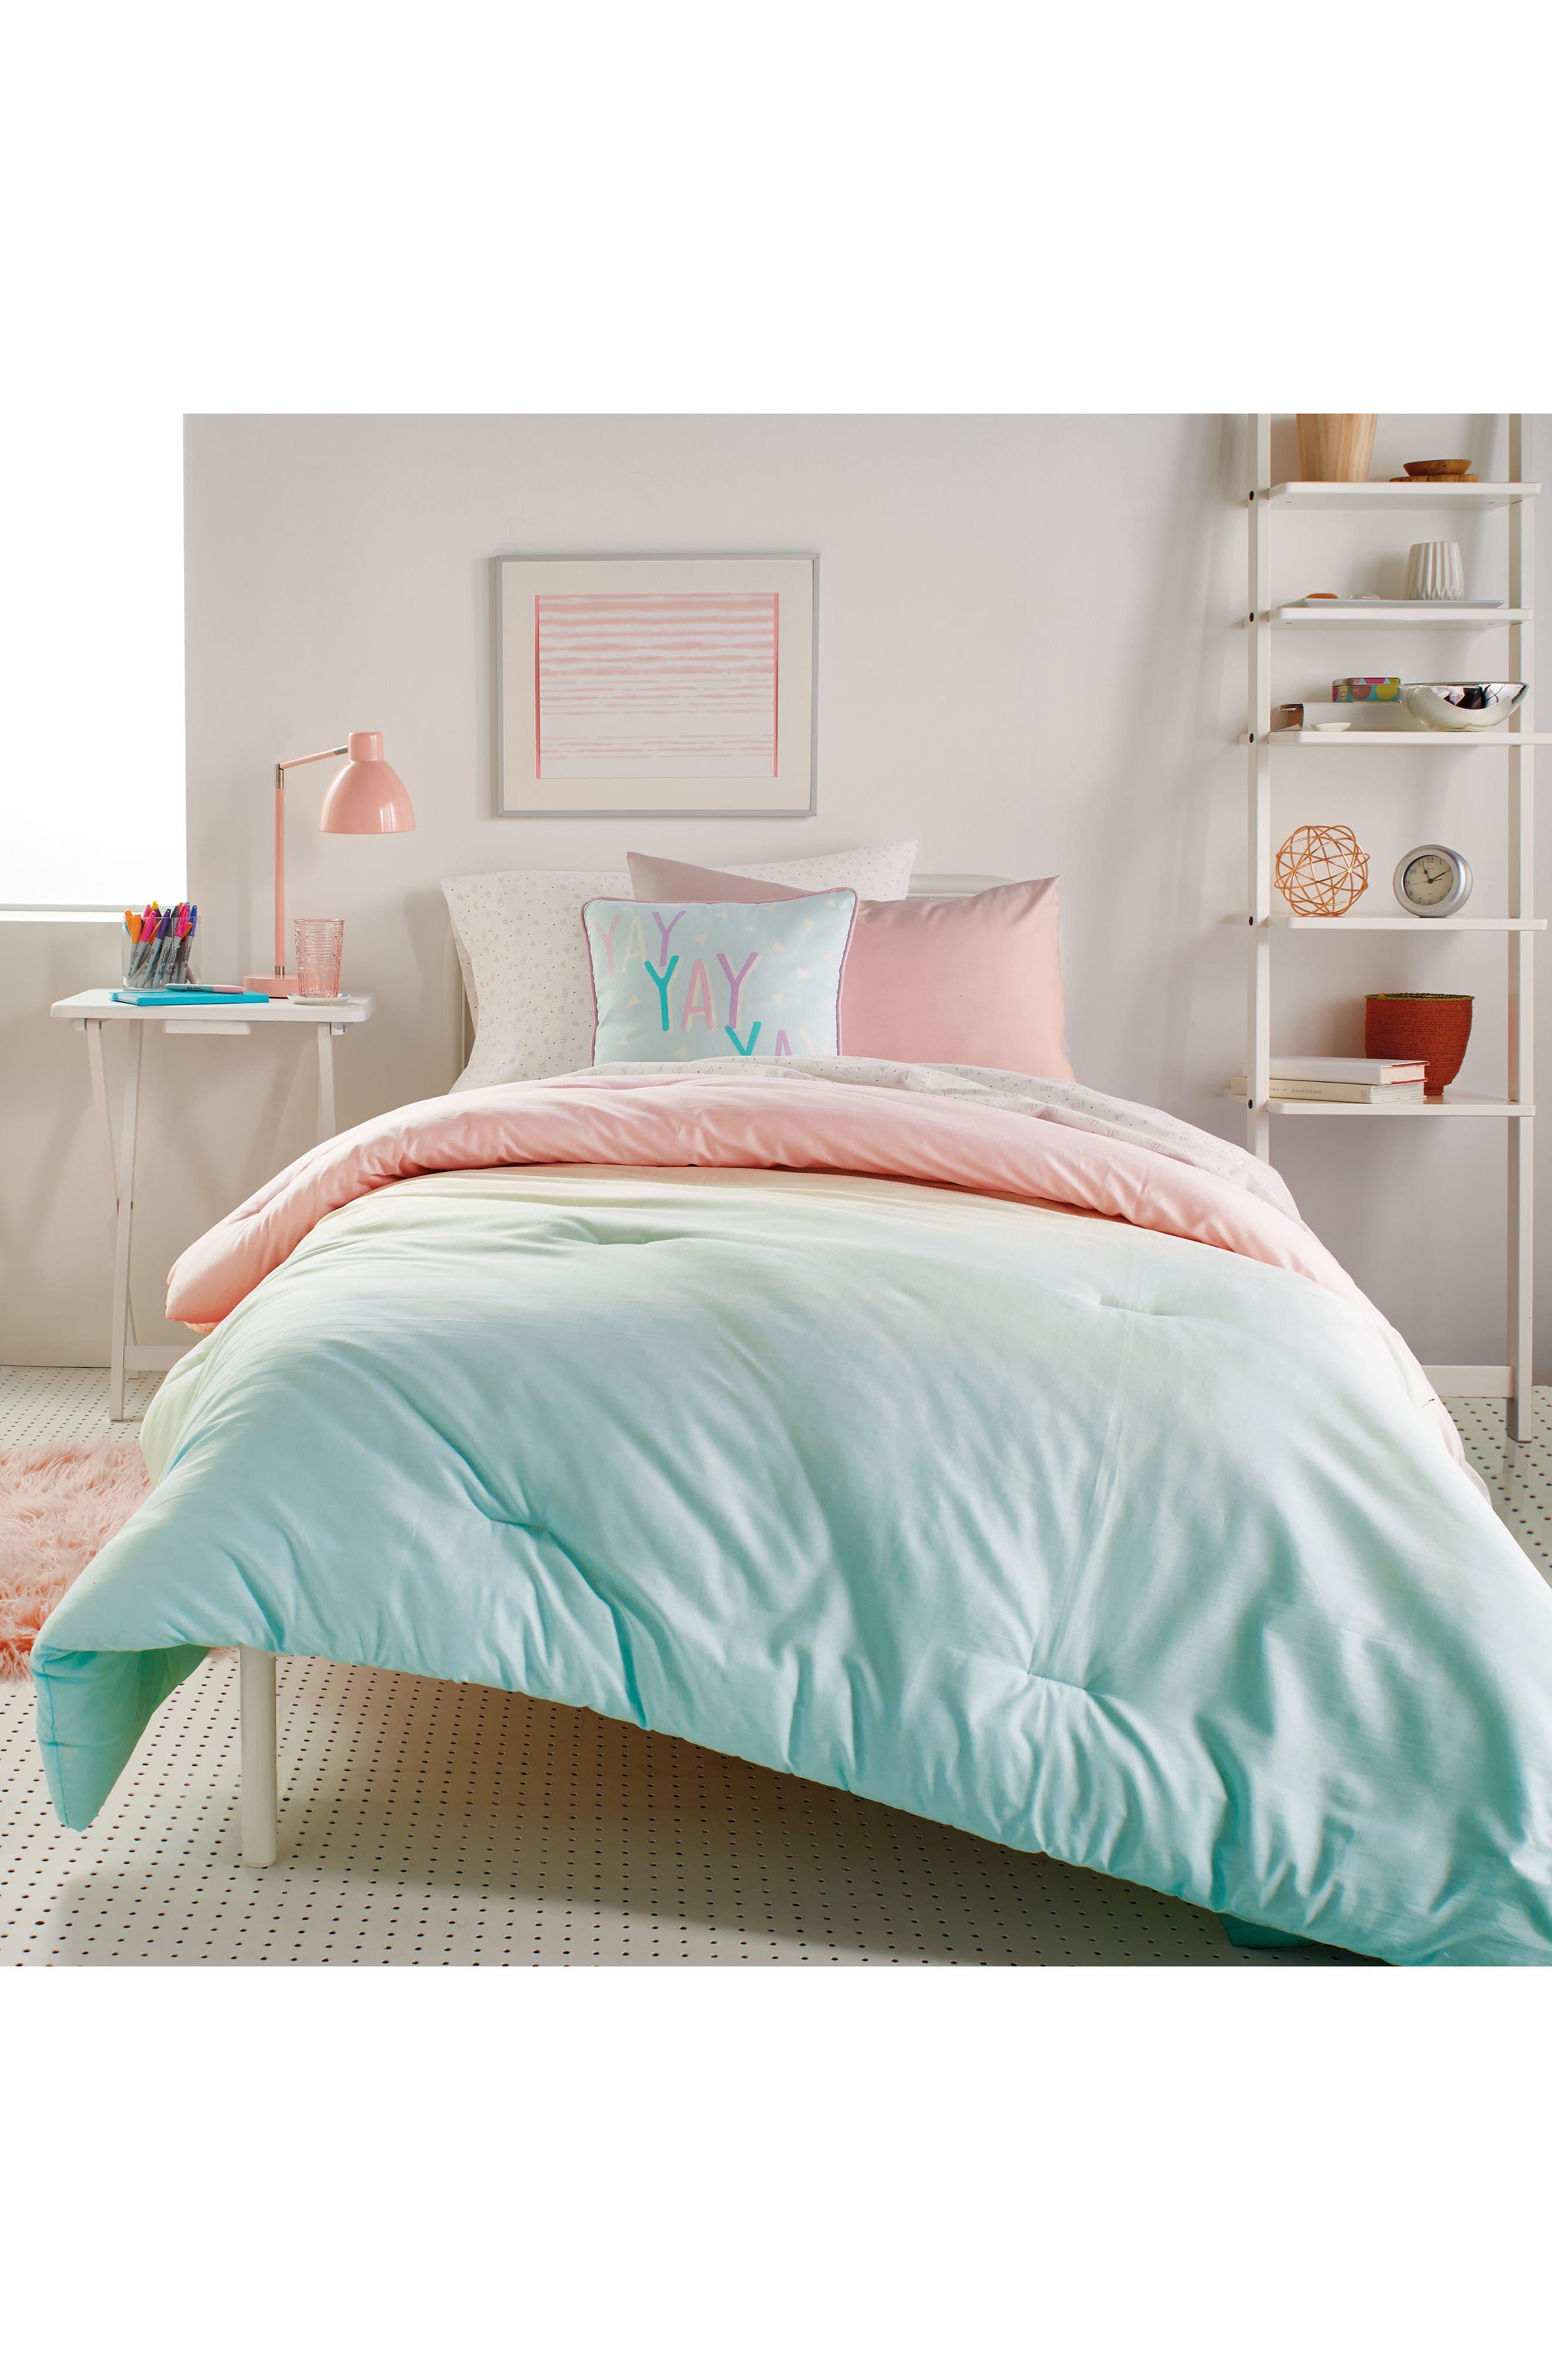 DKNY, Empire Light Comforter, Sham & Accent Pillow Set, Main thumbnail 1, color, 675